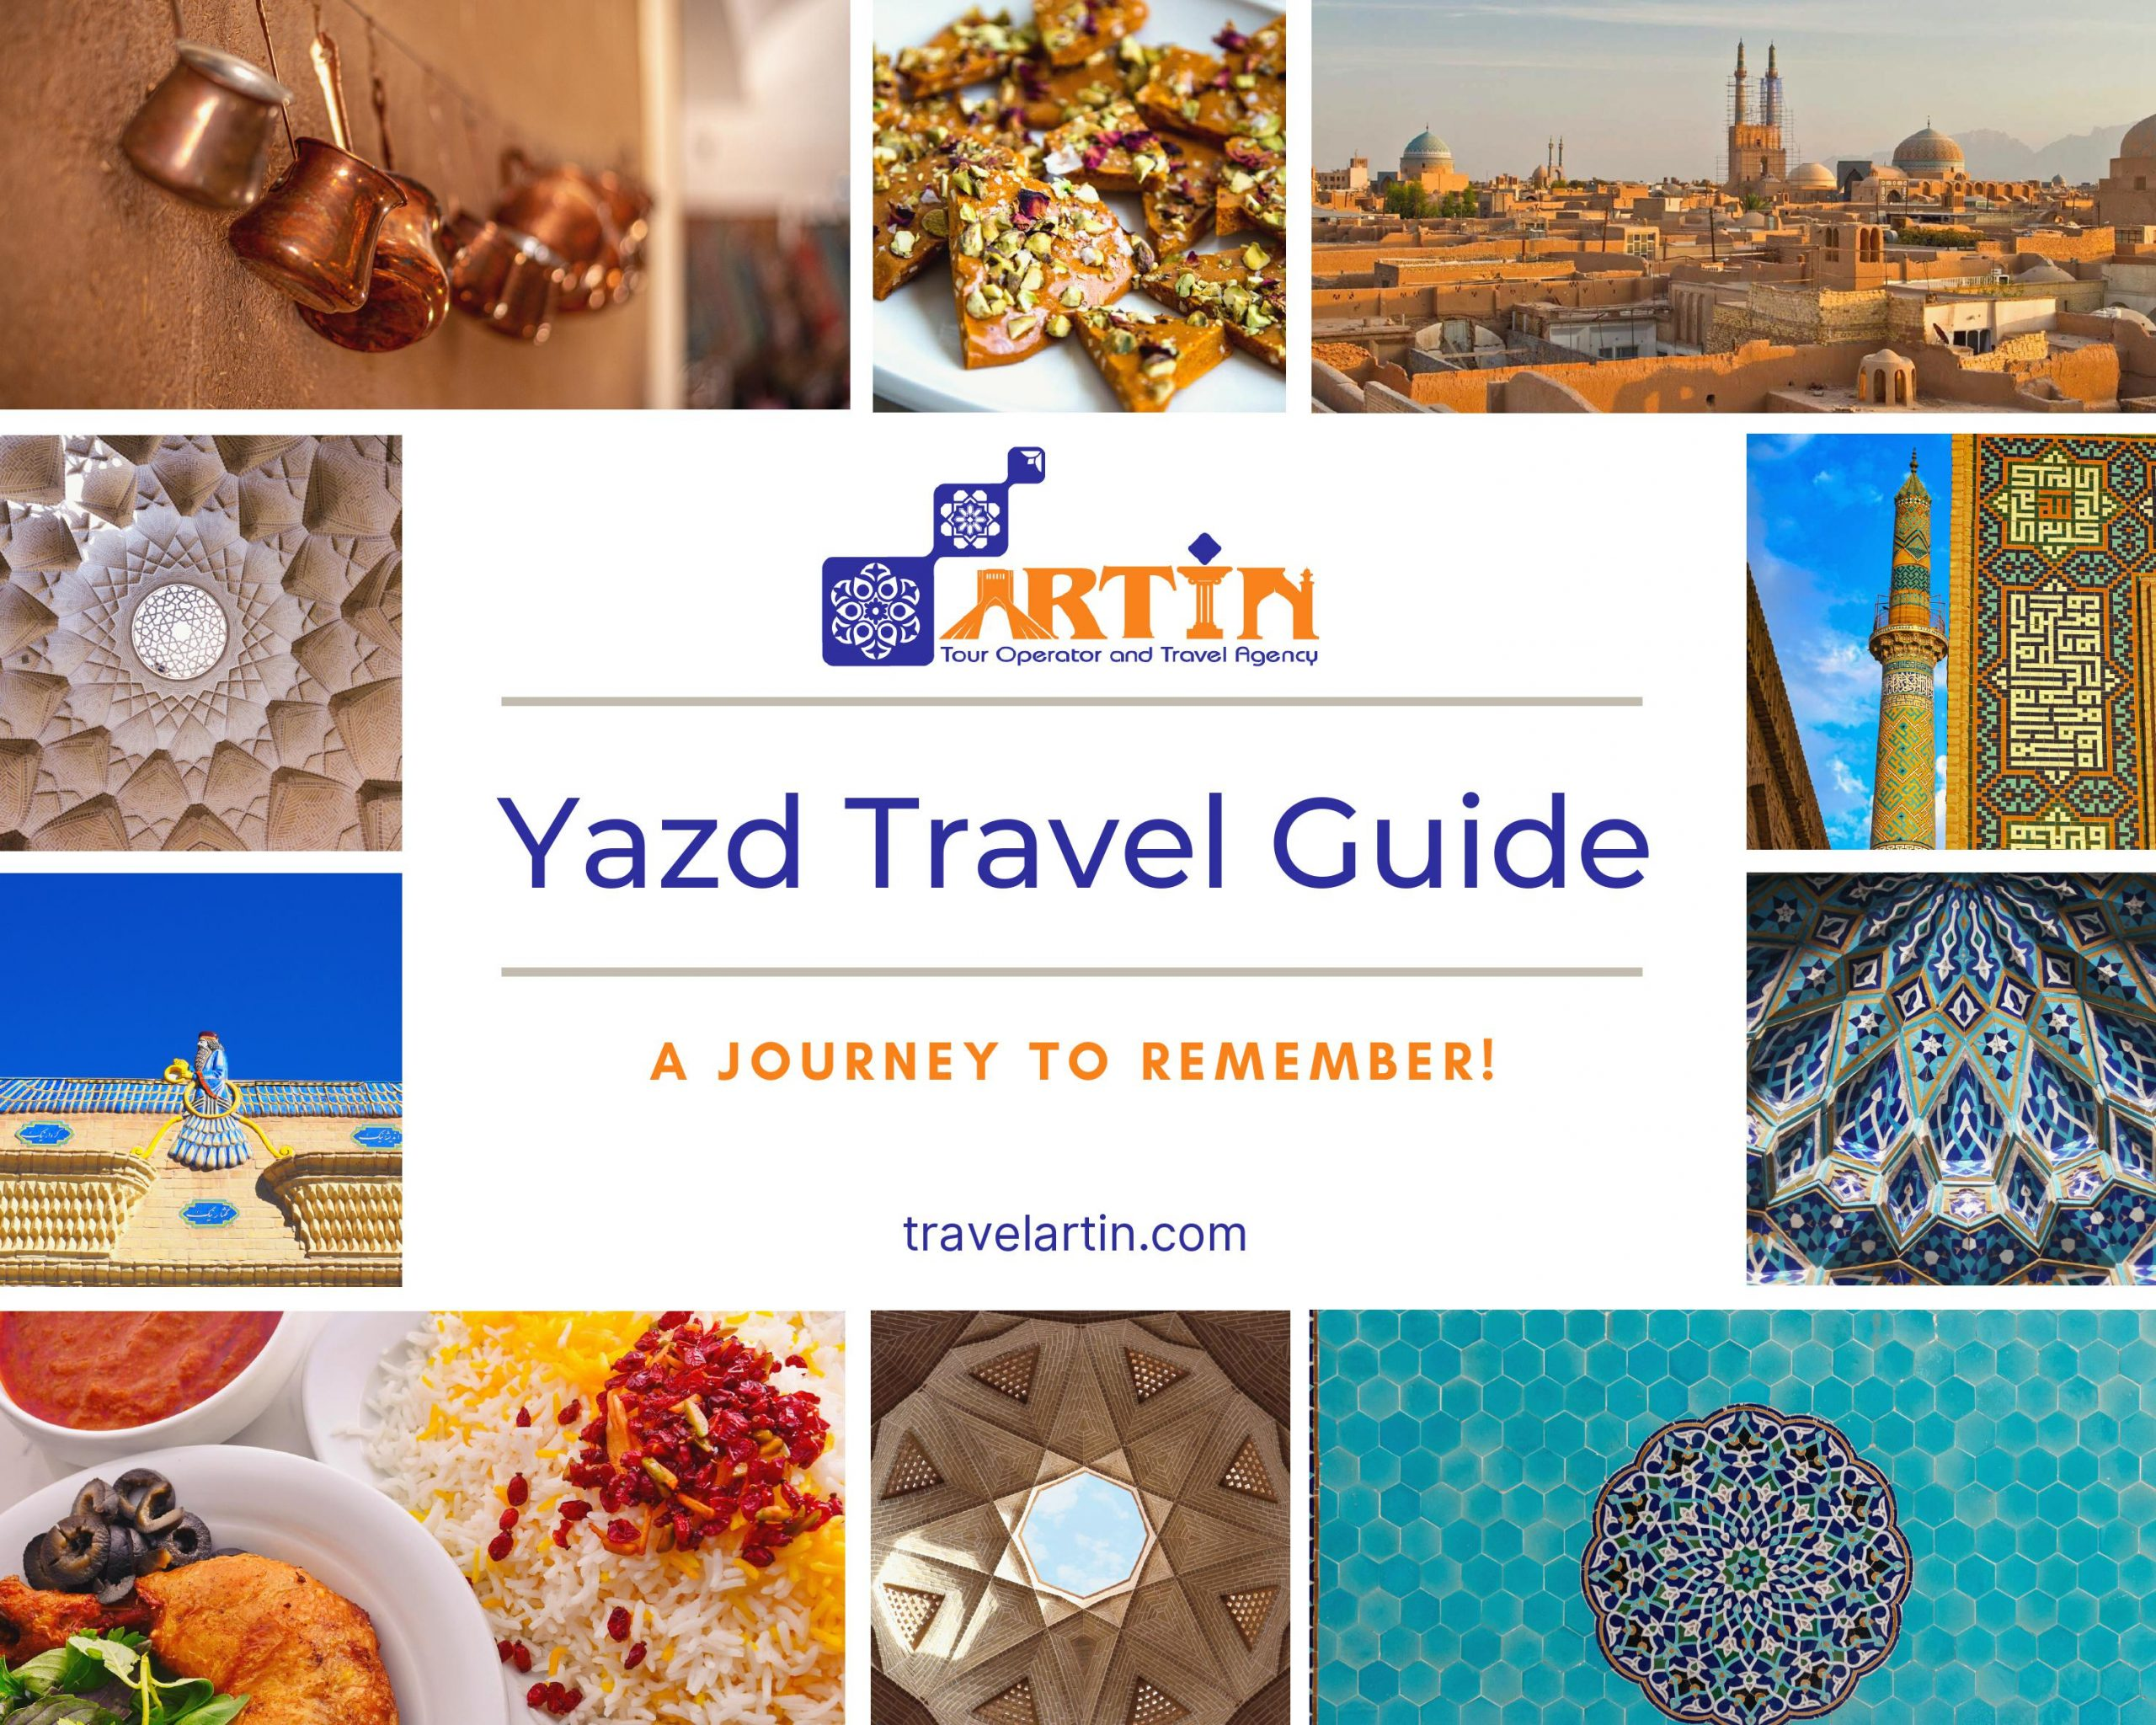 A travel guide to Yazd city ArtinTravel.com